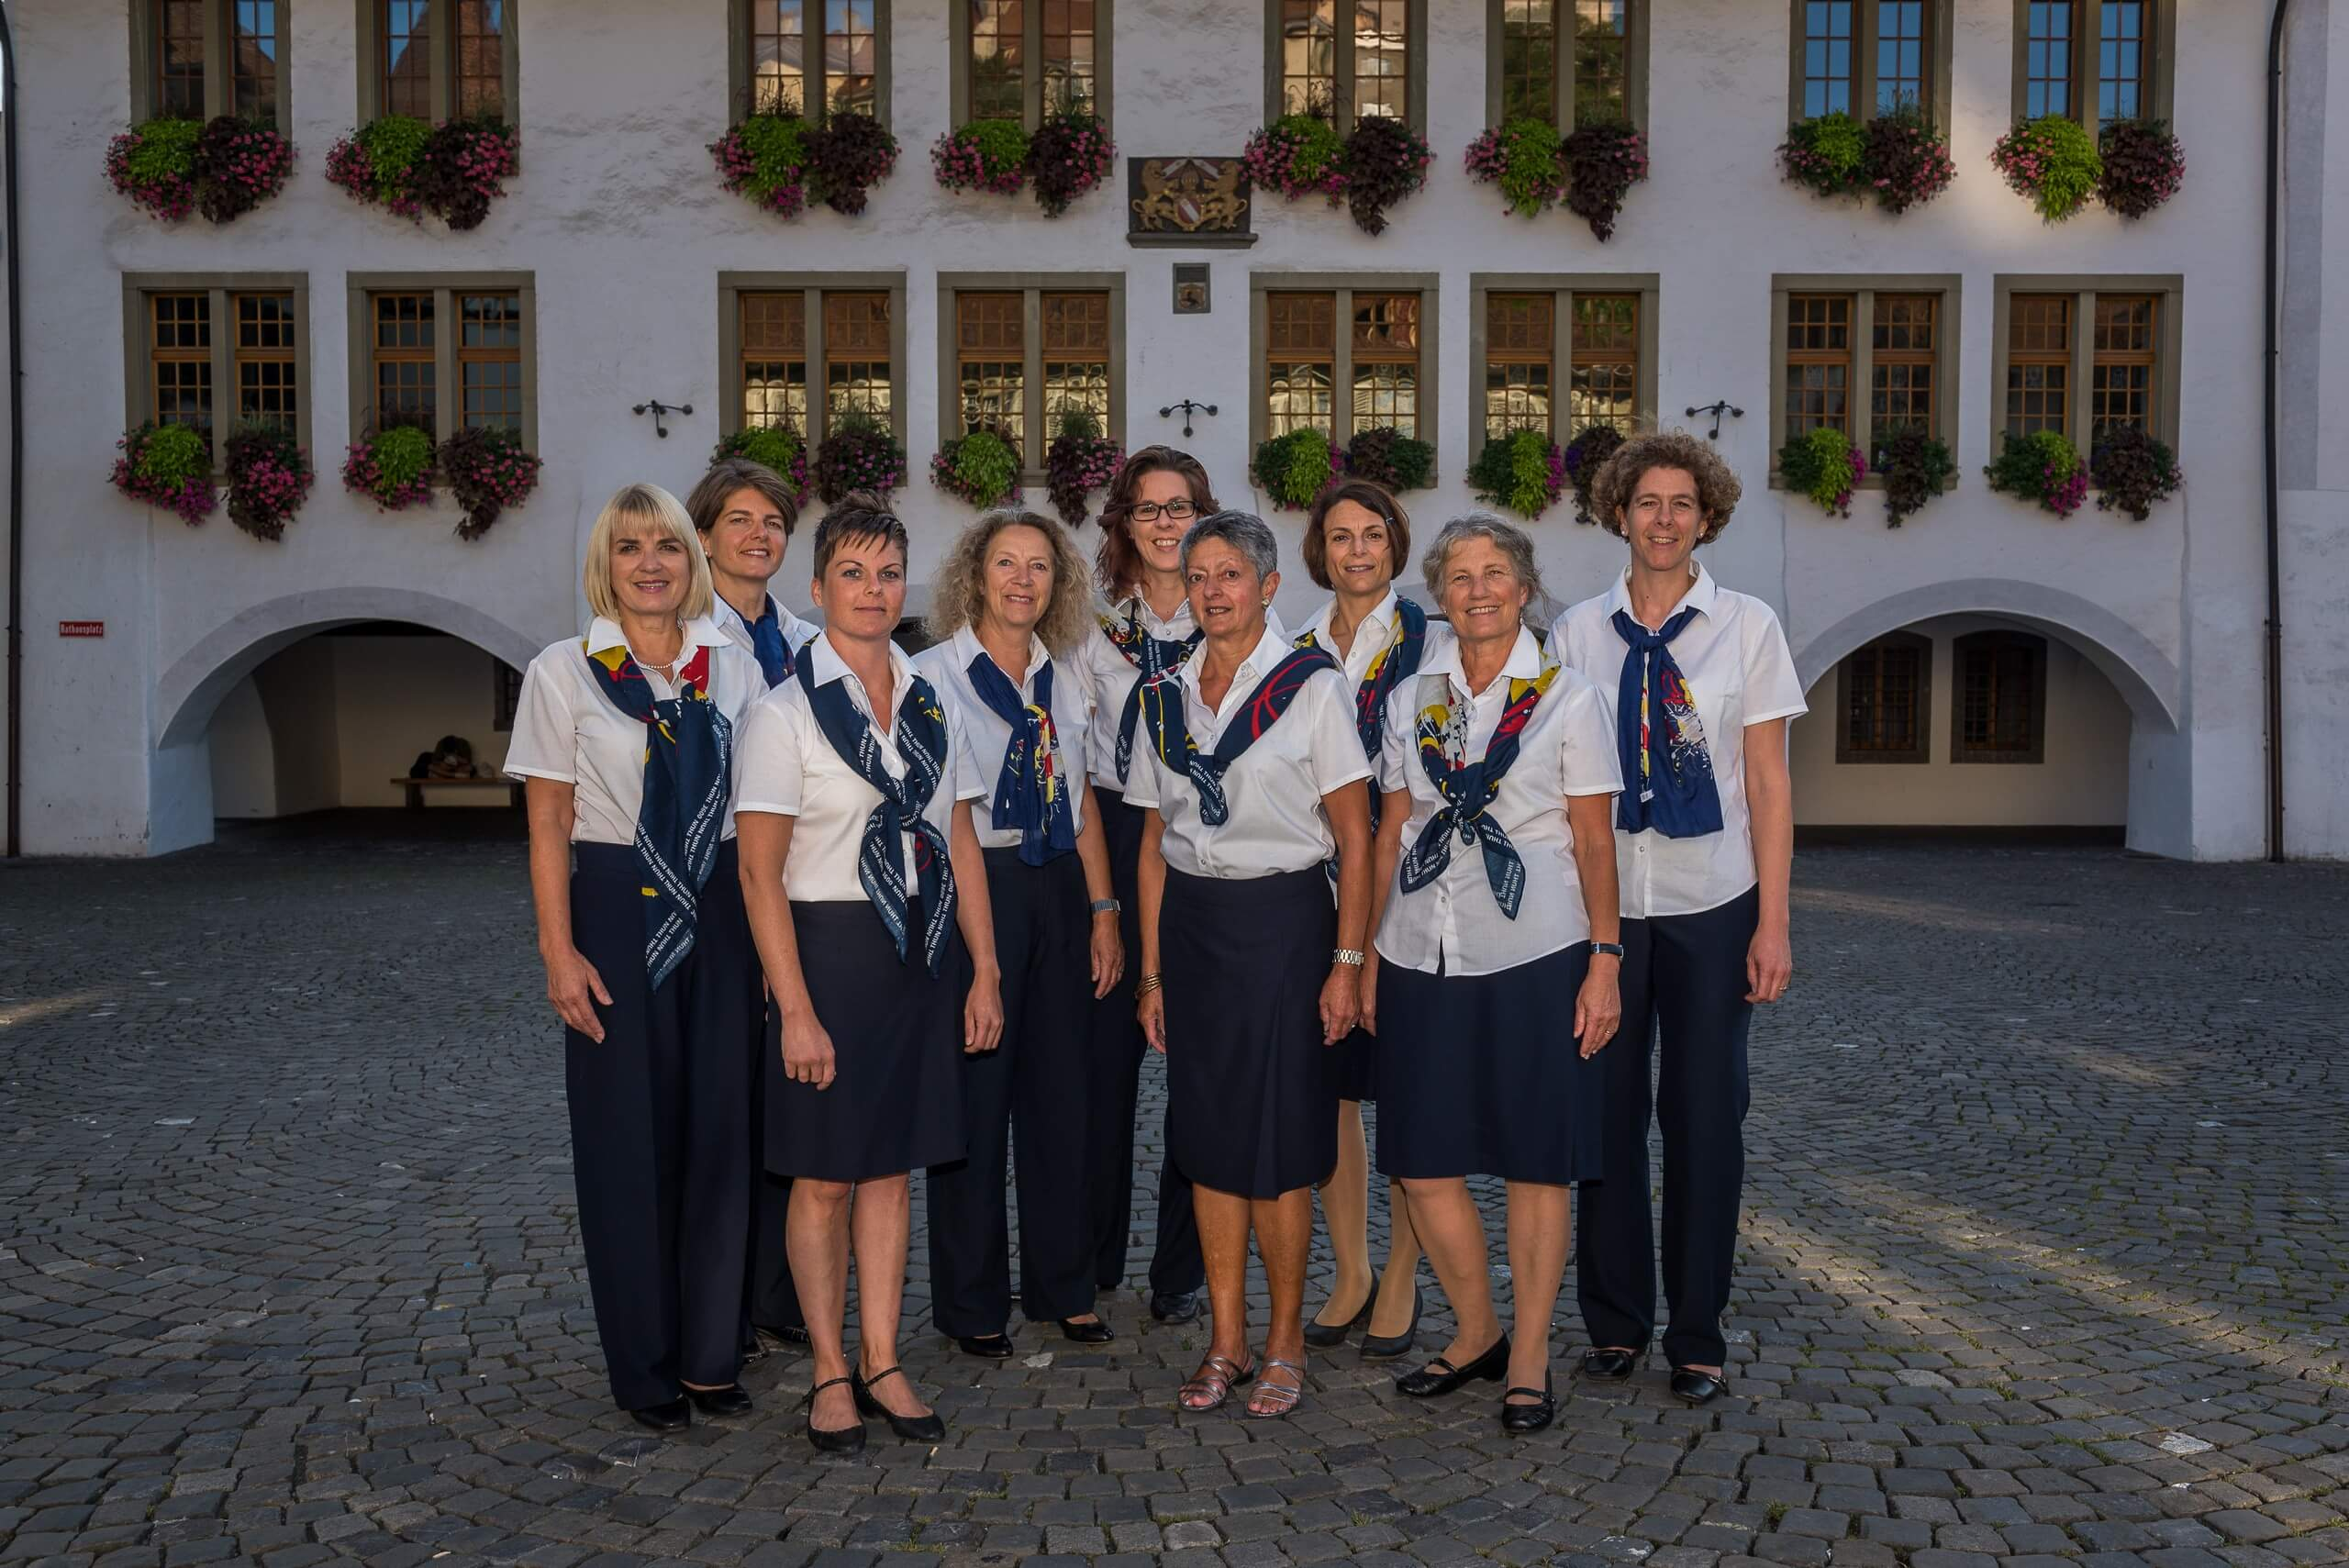 thun-stadtfuehrungen-sommer-gruppenbild-rathausplatz